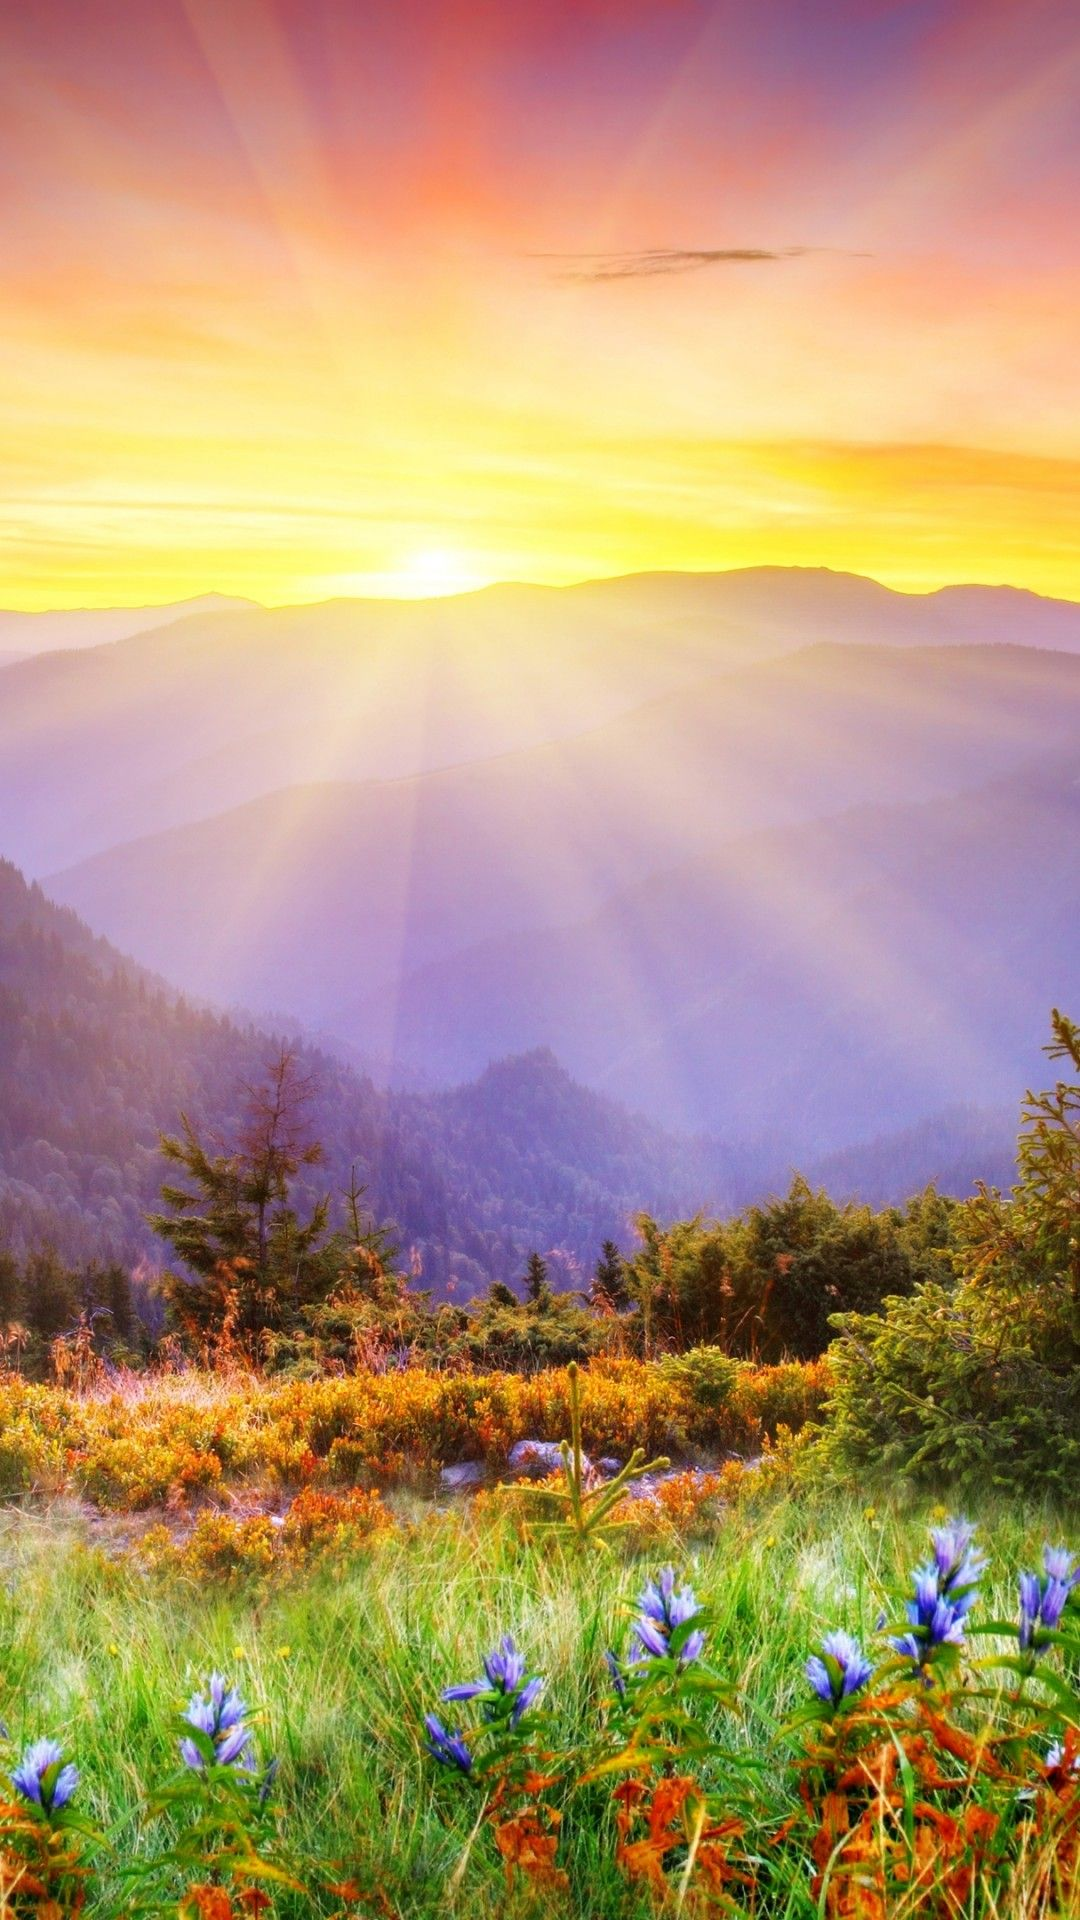 Magical Landscape 4k Ultra Hd Wallpaper 4k Wallpaper Net Landscape Photography Beautiful Landscapes Sunrise Wallpaper